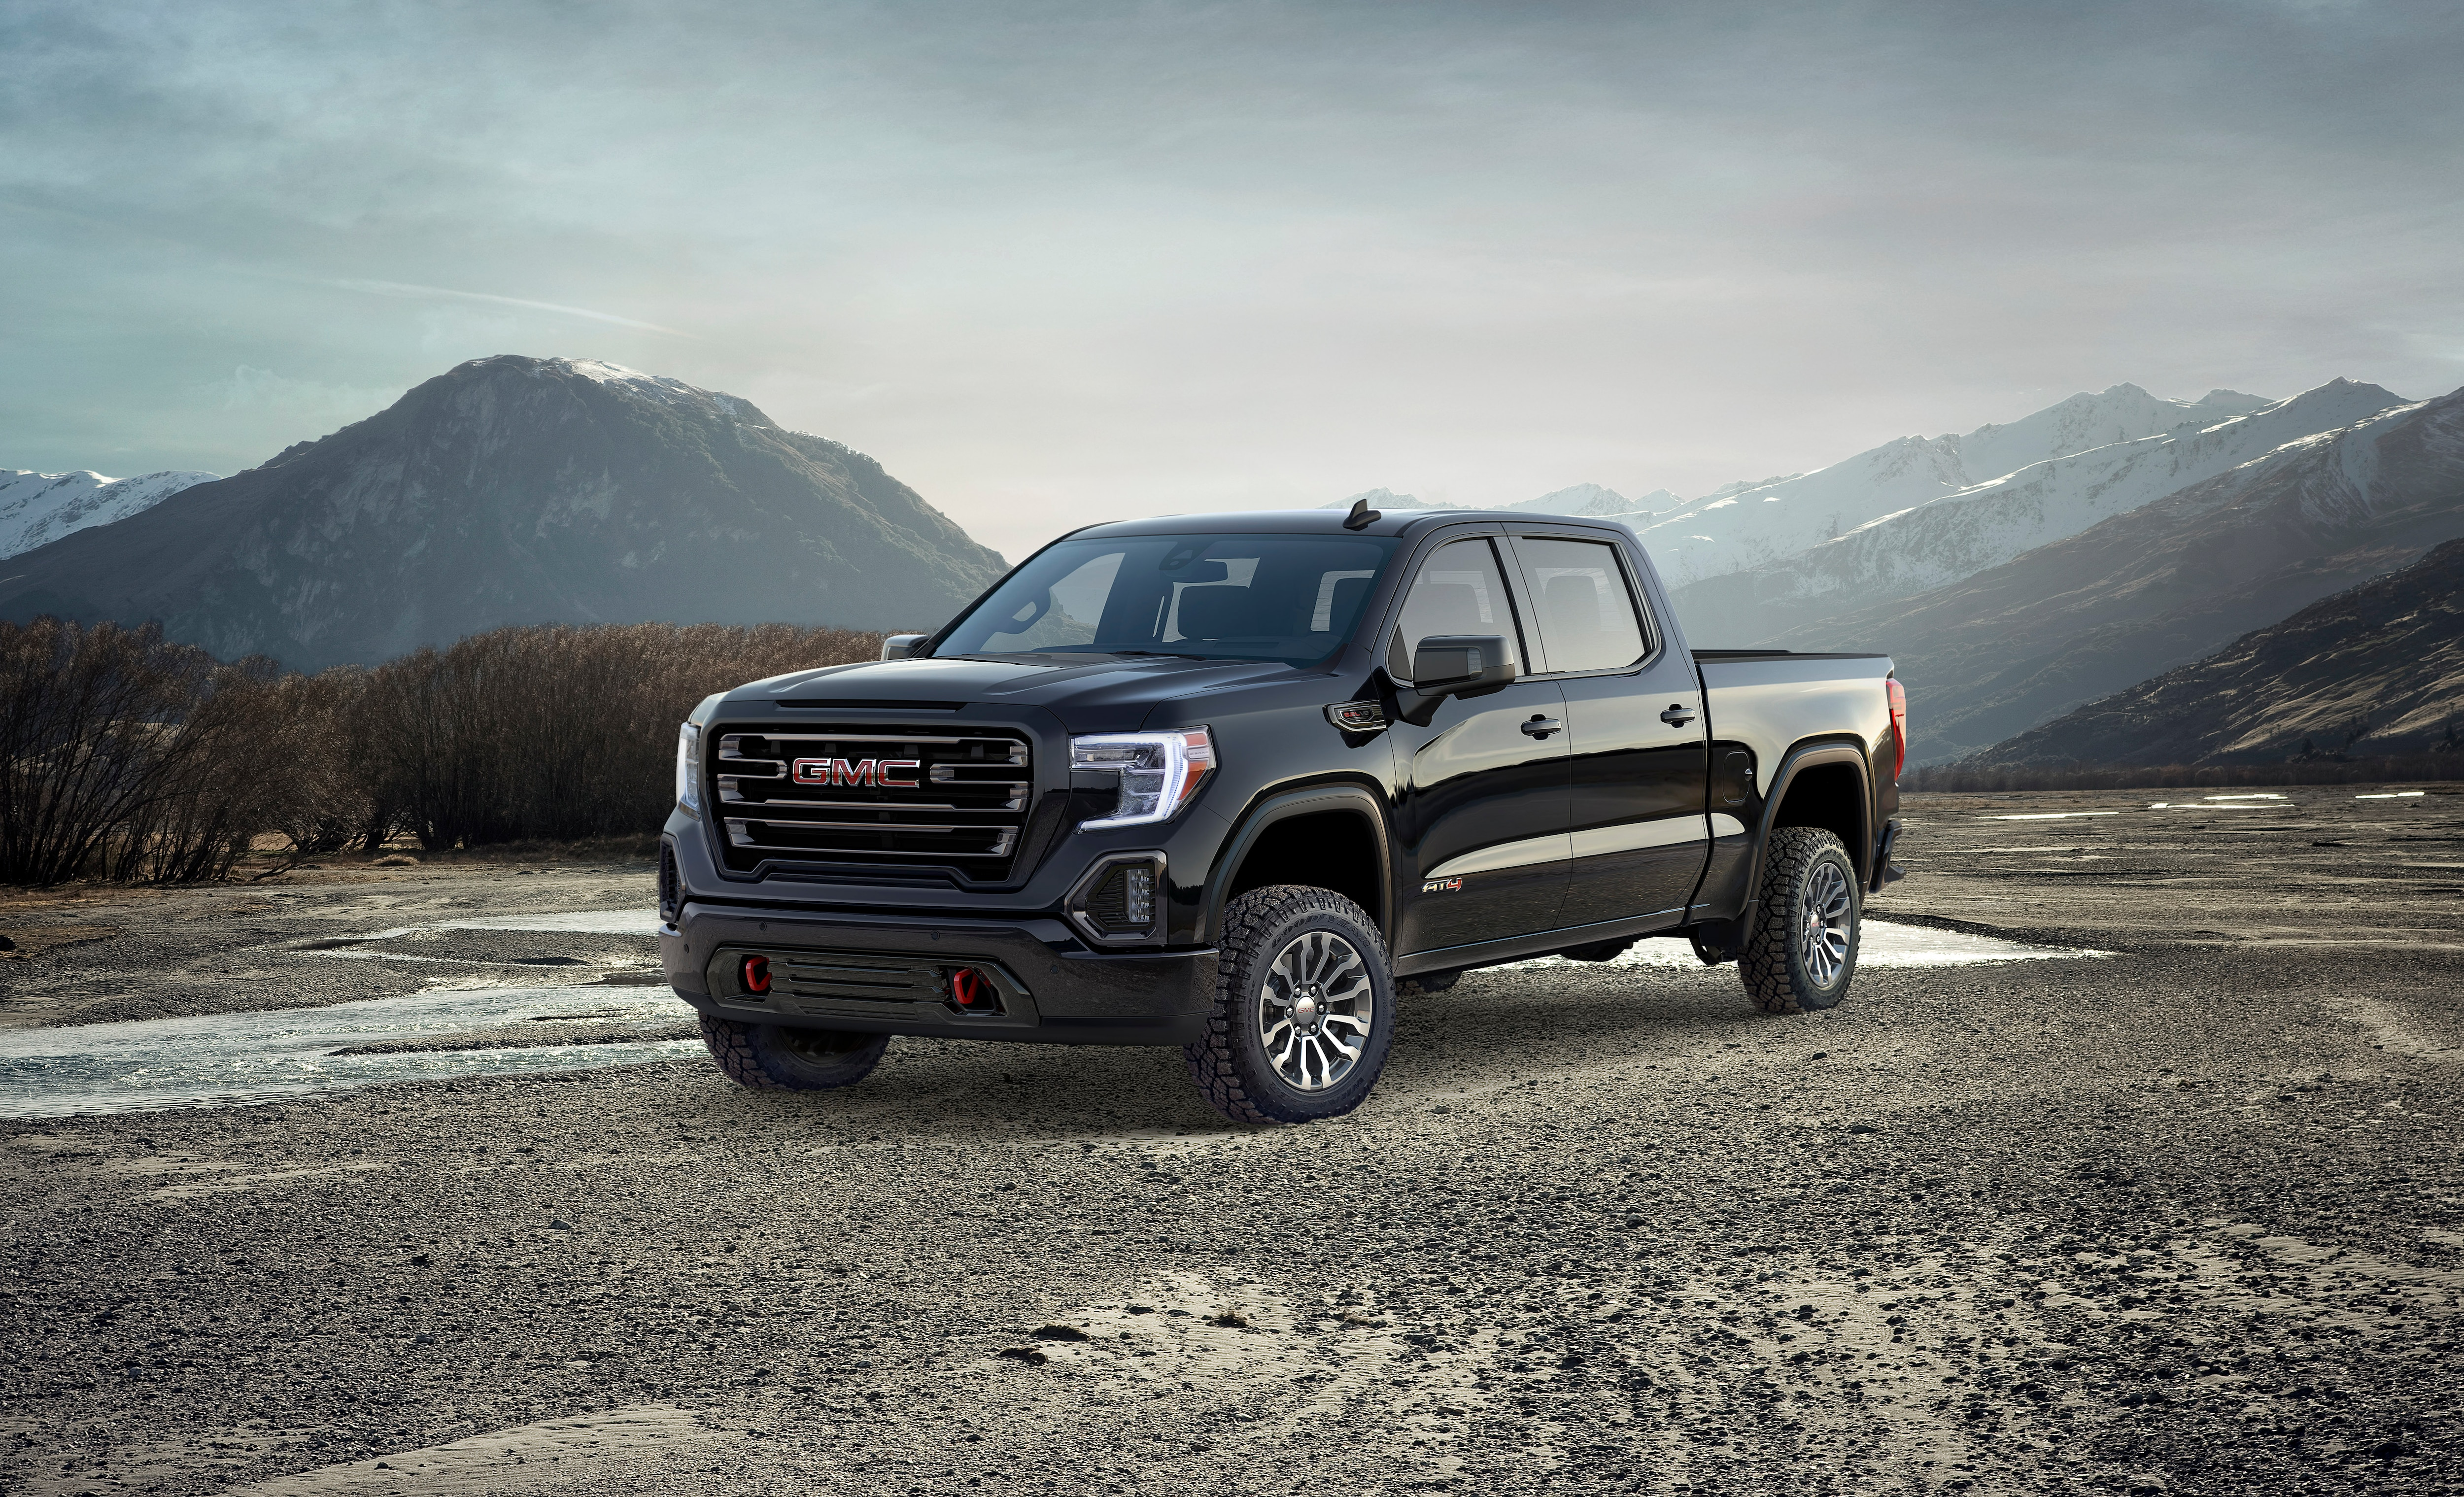 2019 Sierra AT4: Pickup Truck - GMC